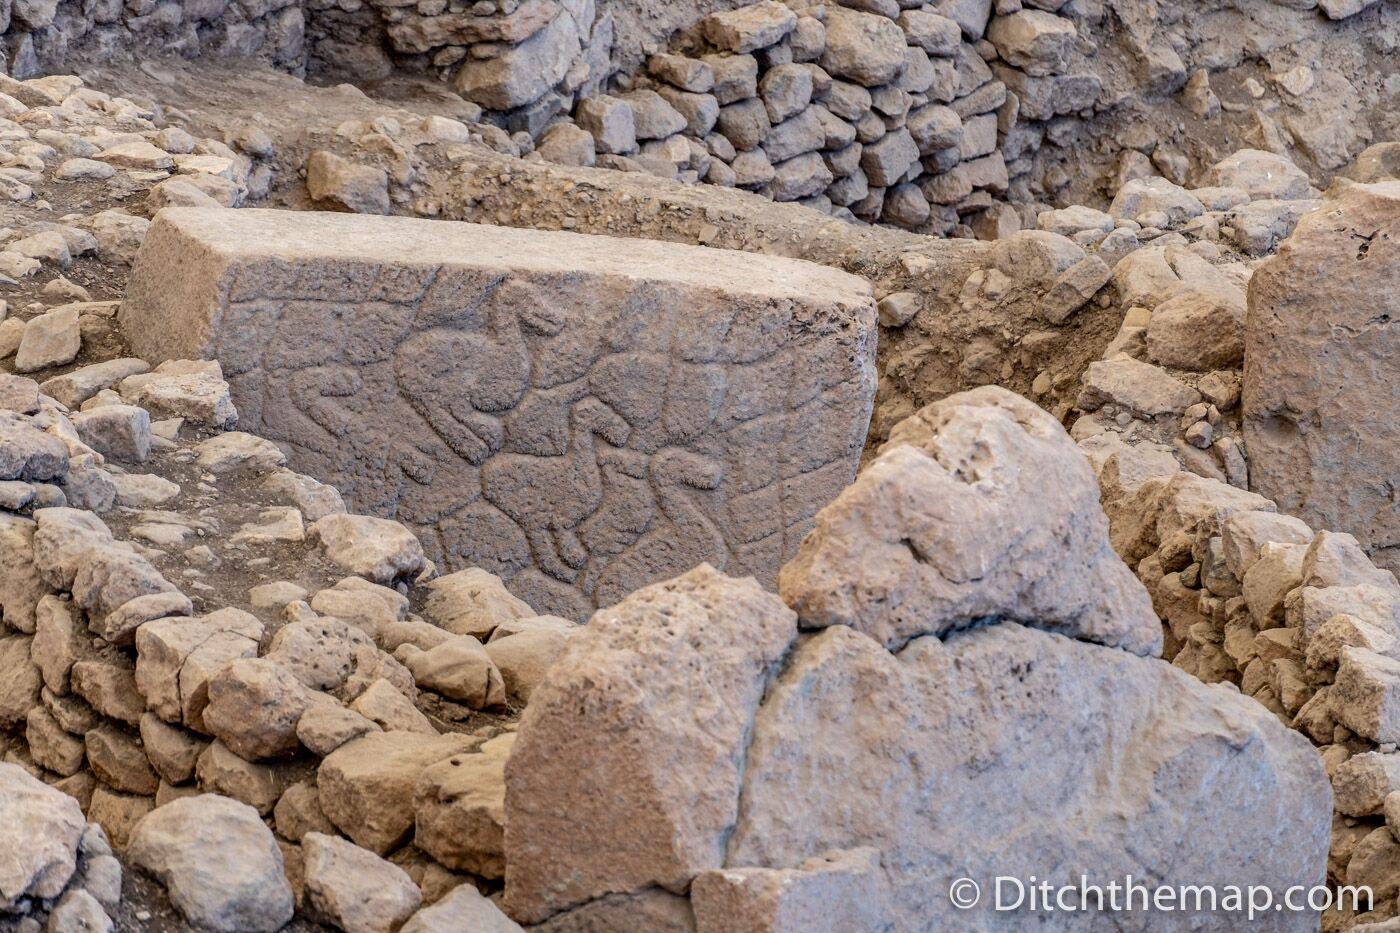 Stone engravings on limestone pillars at Gobekli Tepe